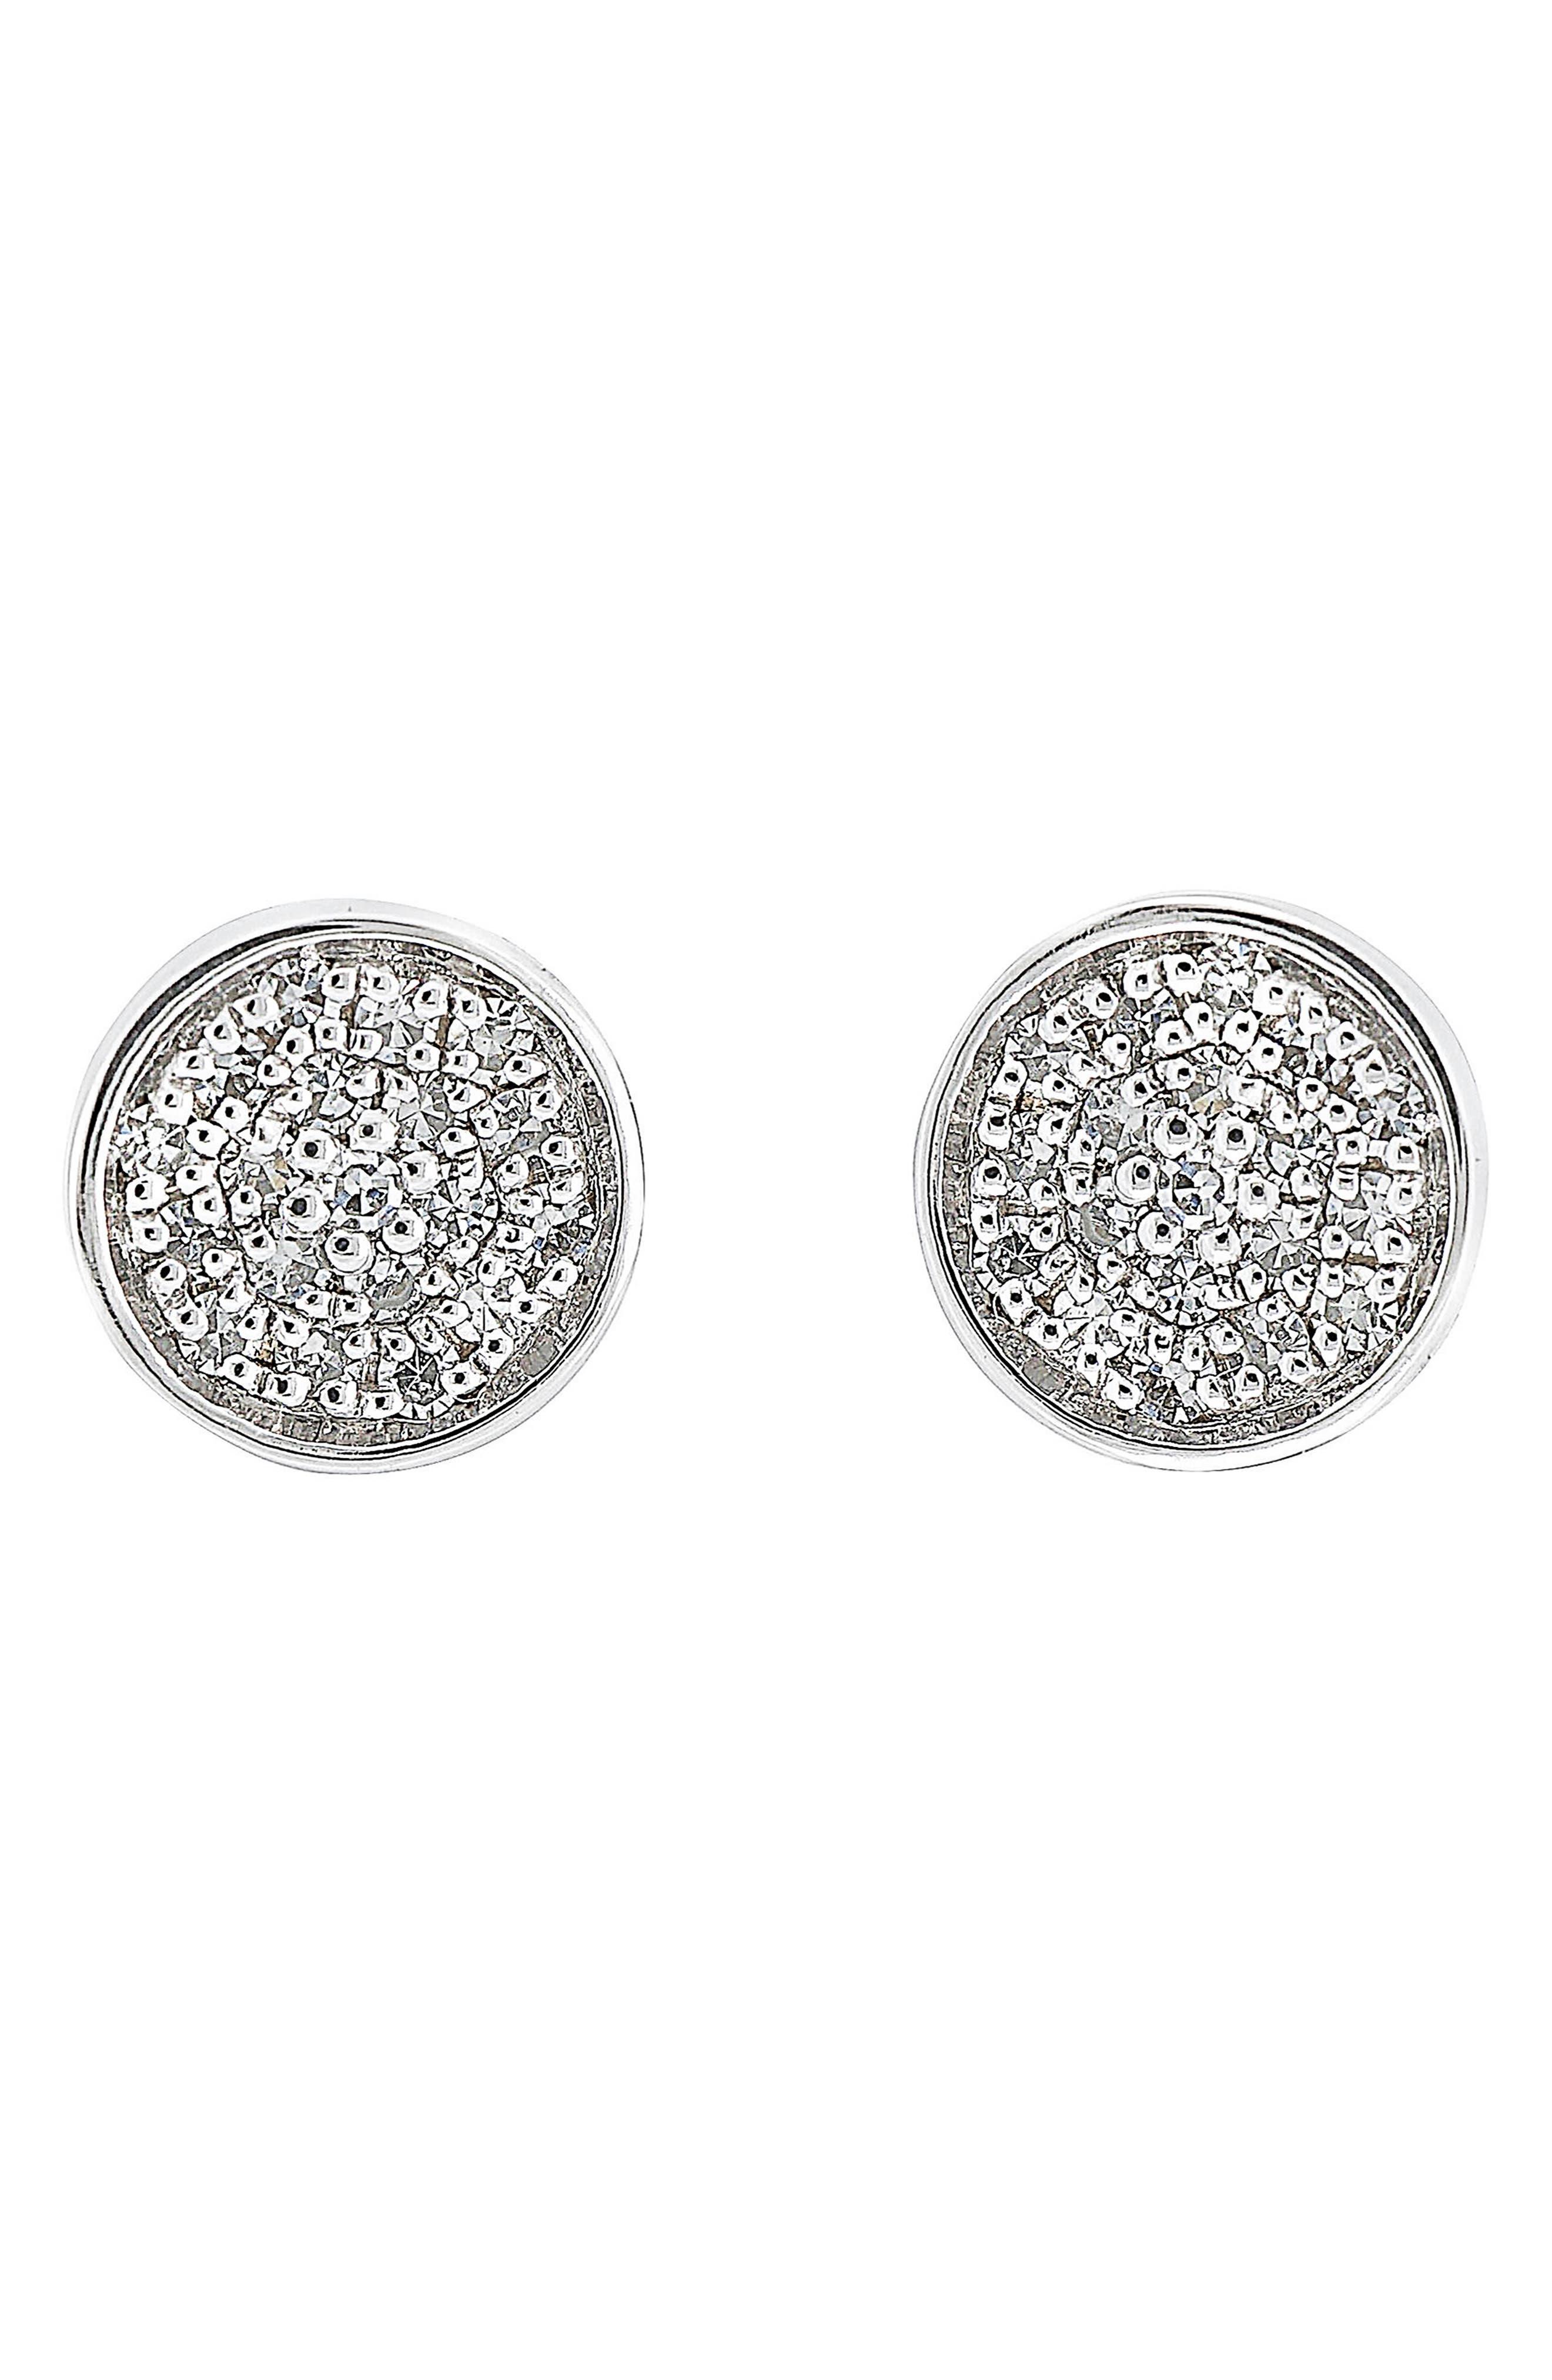 Carrière Pavé Disc Stud Earrings,                             Main thumbnail 1, color,                             Silver/ Diamond